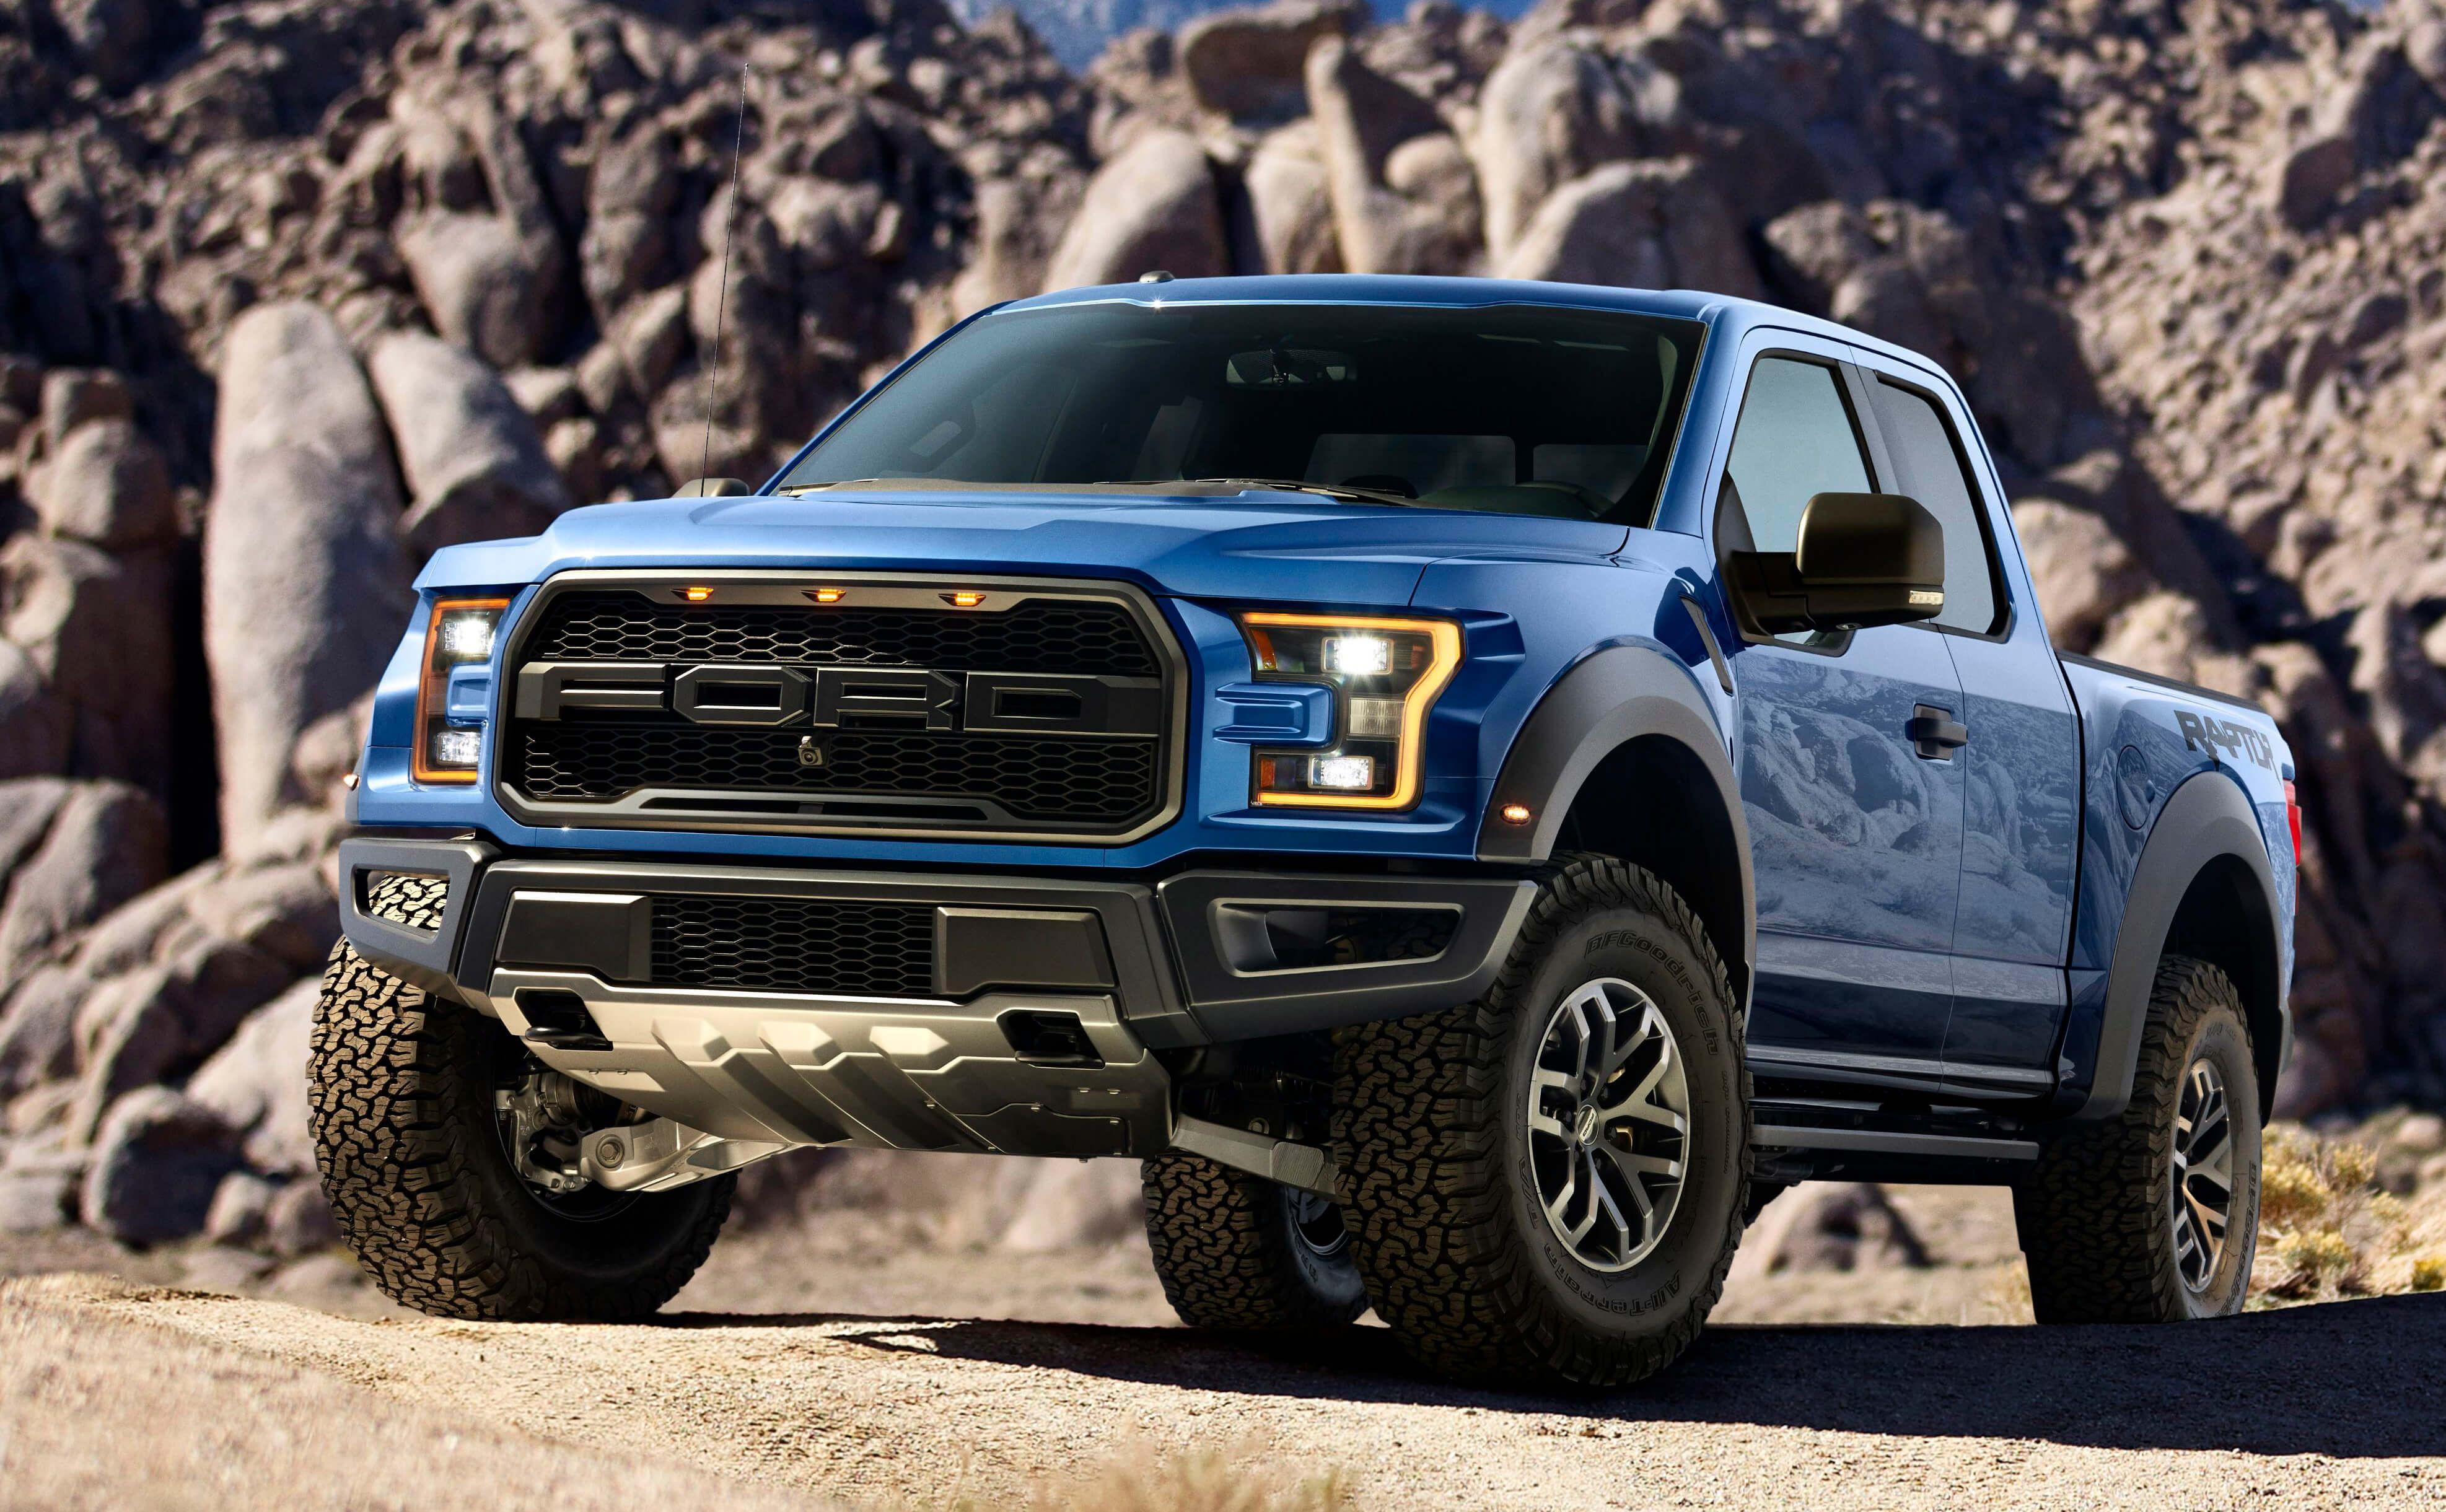 2017 Ford Raptor In Lightning Blue Jpg 3948 2441 Ford Raptor